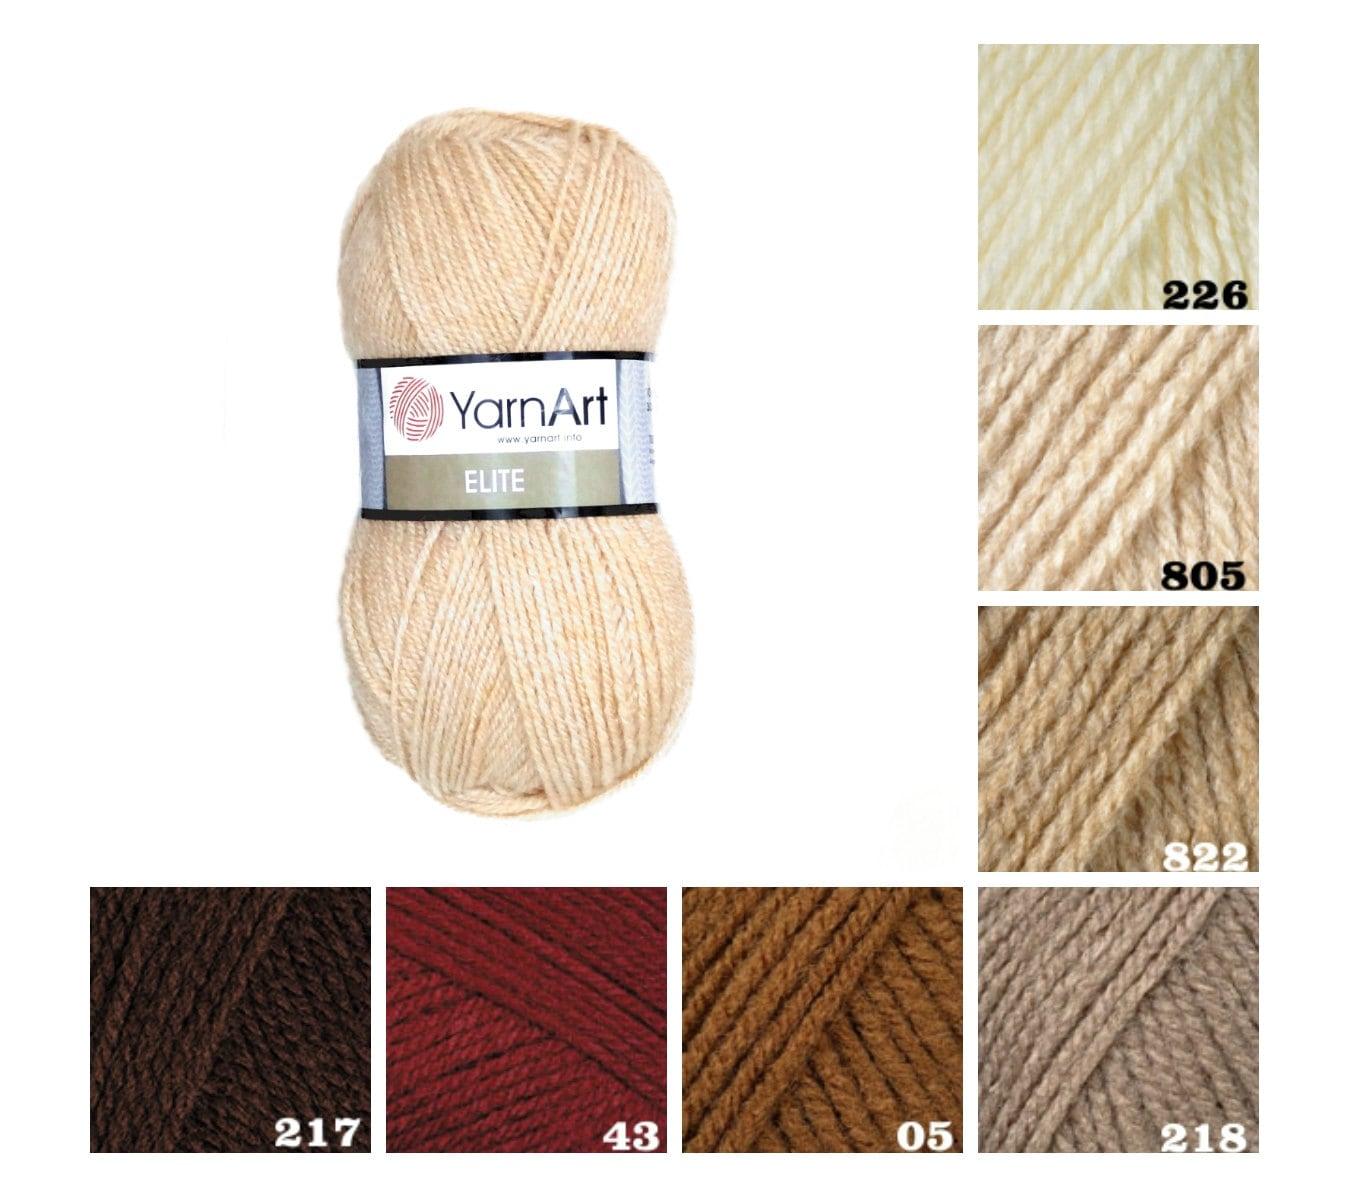 Knitting Pattern Suppliers : YarnArt EL?TE knitting supplies brown beige pattern yarn